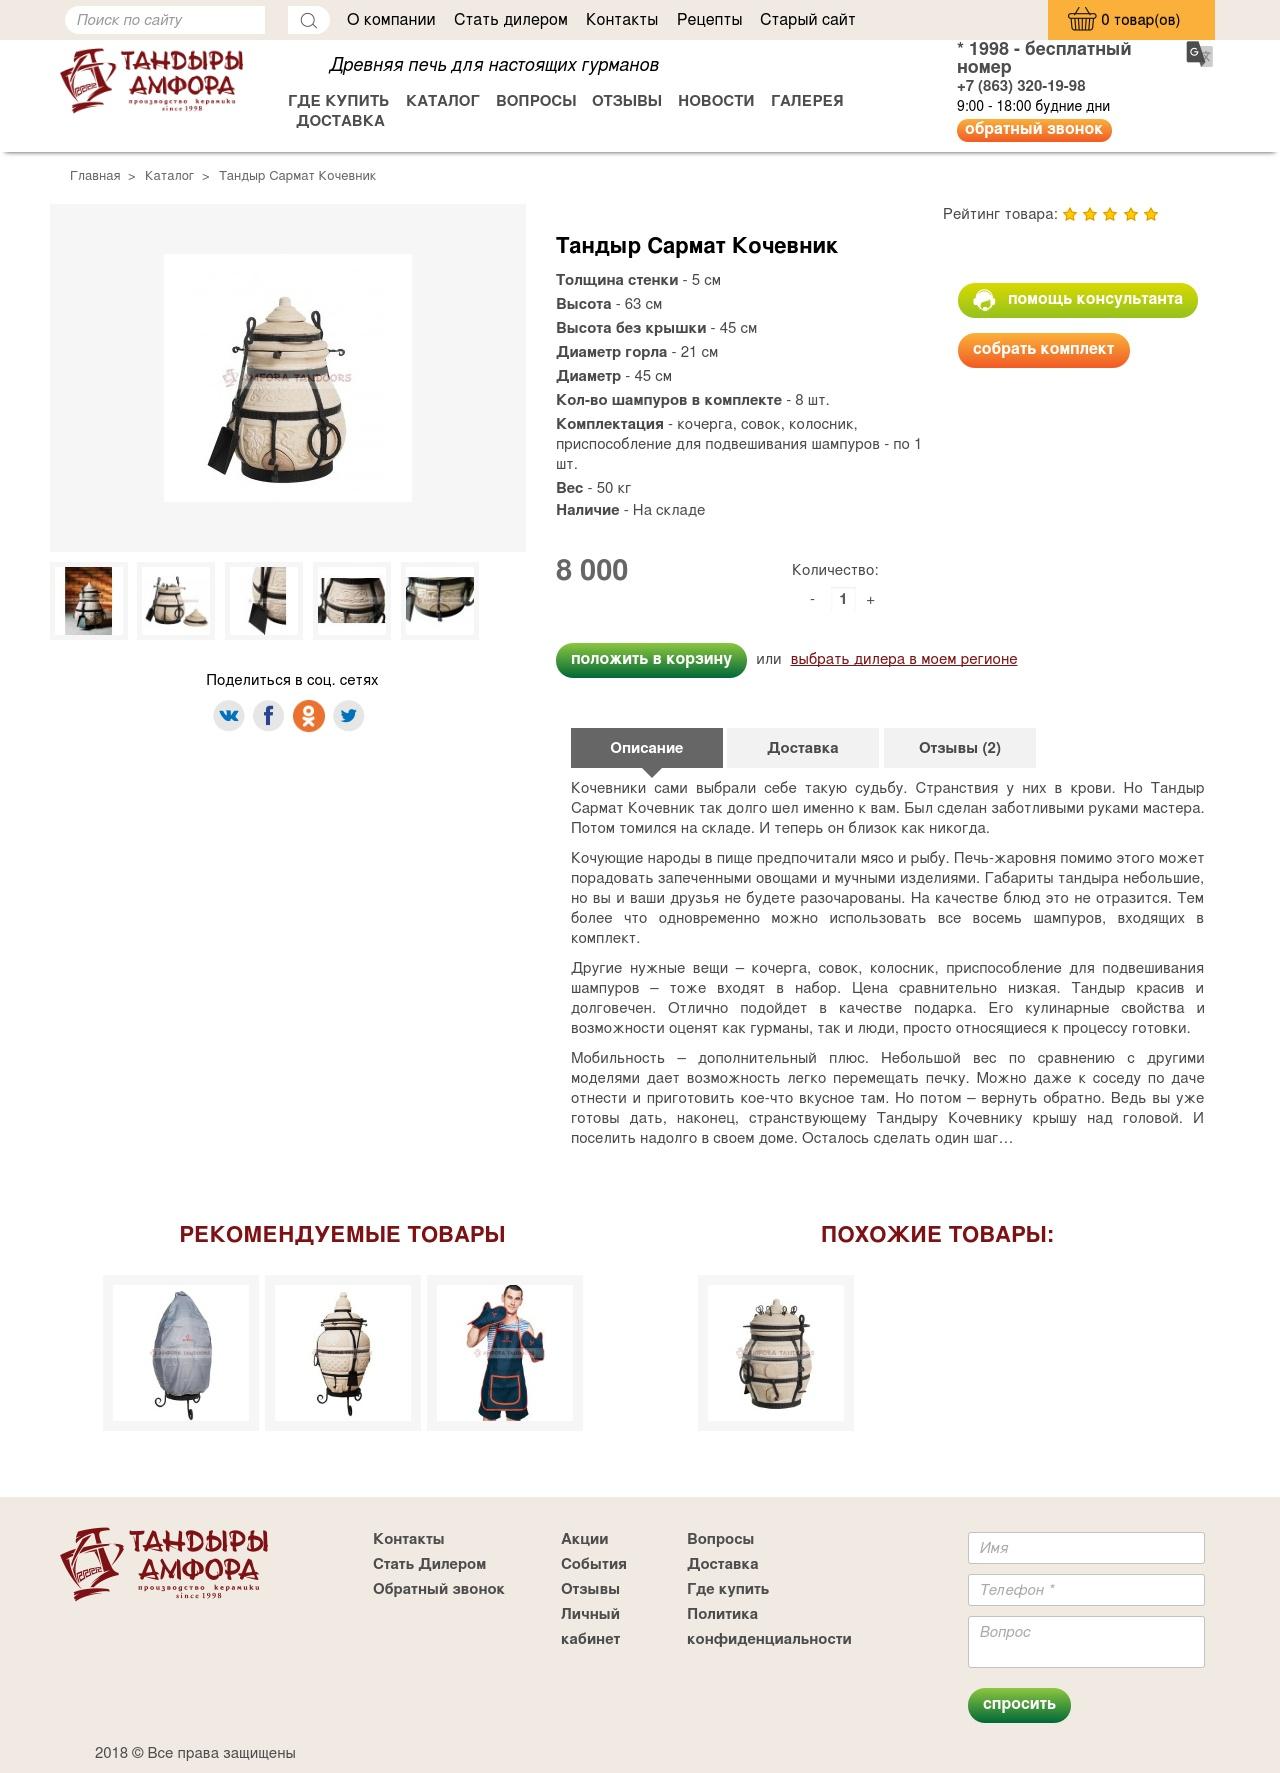 Продающий текст. Тандыр Сармат Кочевник